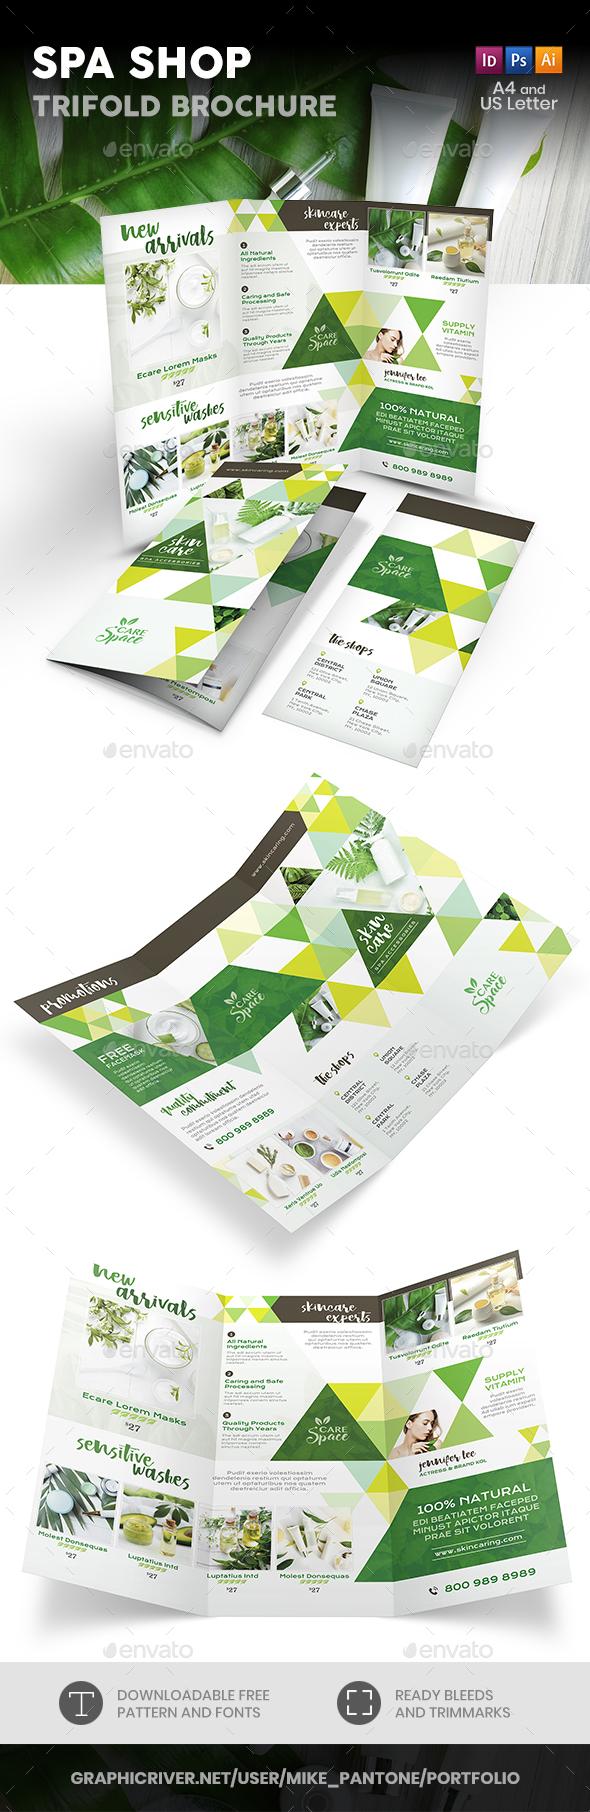 Spa Shop Trifold Brochure - Informational Brochures